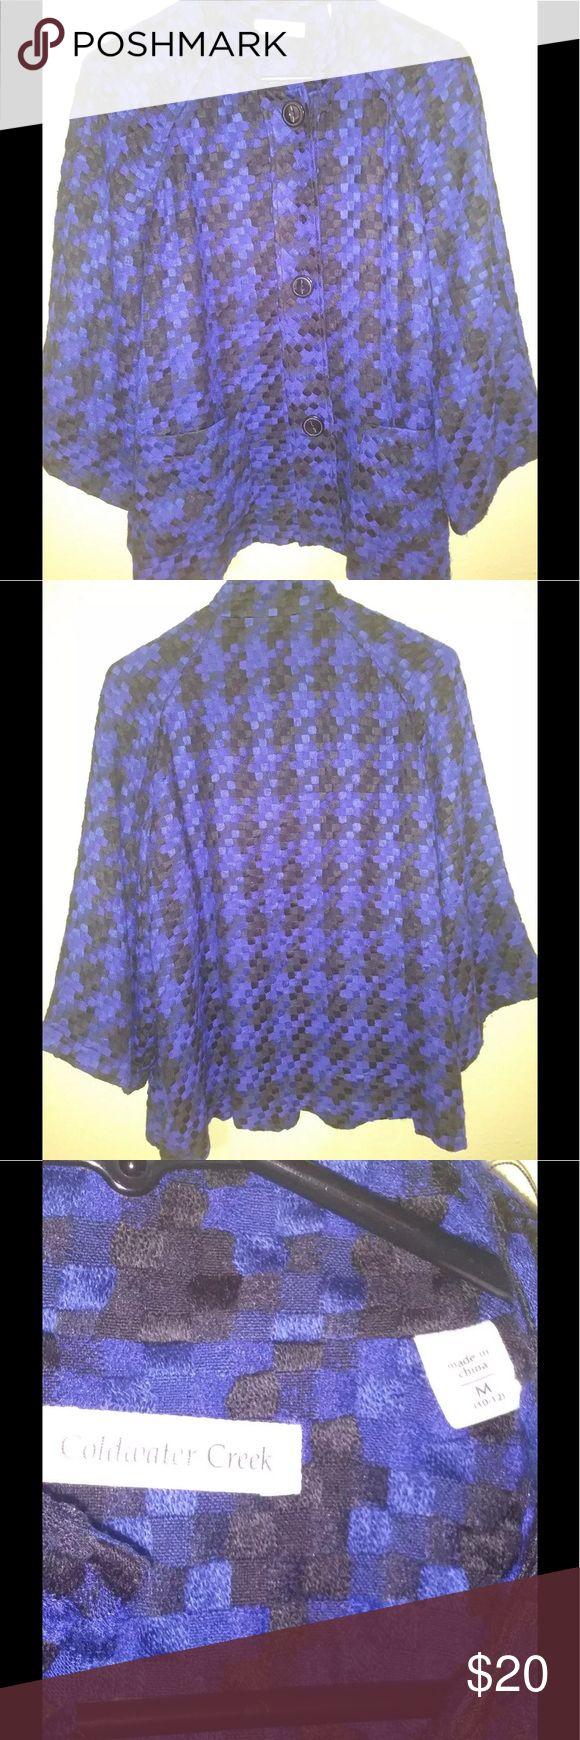 Coldwater Creek vintage blue houndstooth Blazer Coldwater Creek Blue and Black Vintage Houndstooth blazer size M Coldwater Creek Jackets & Coats Blazers